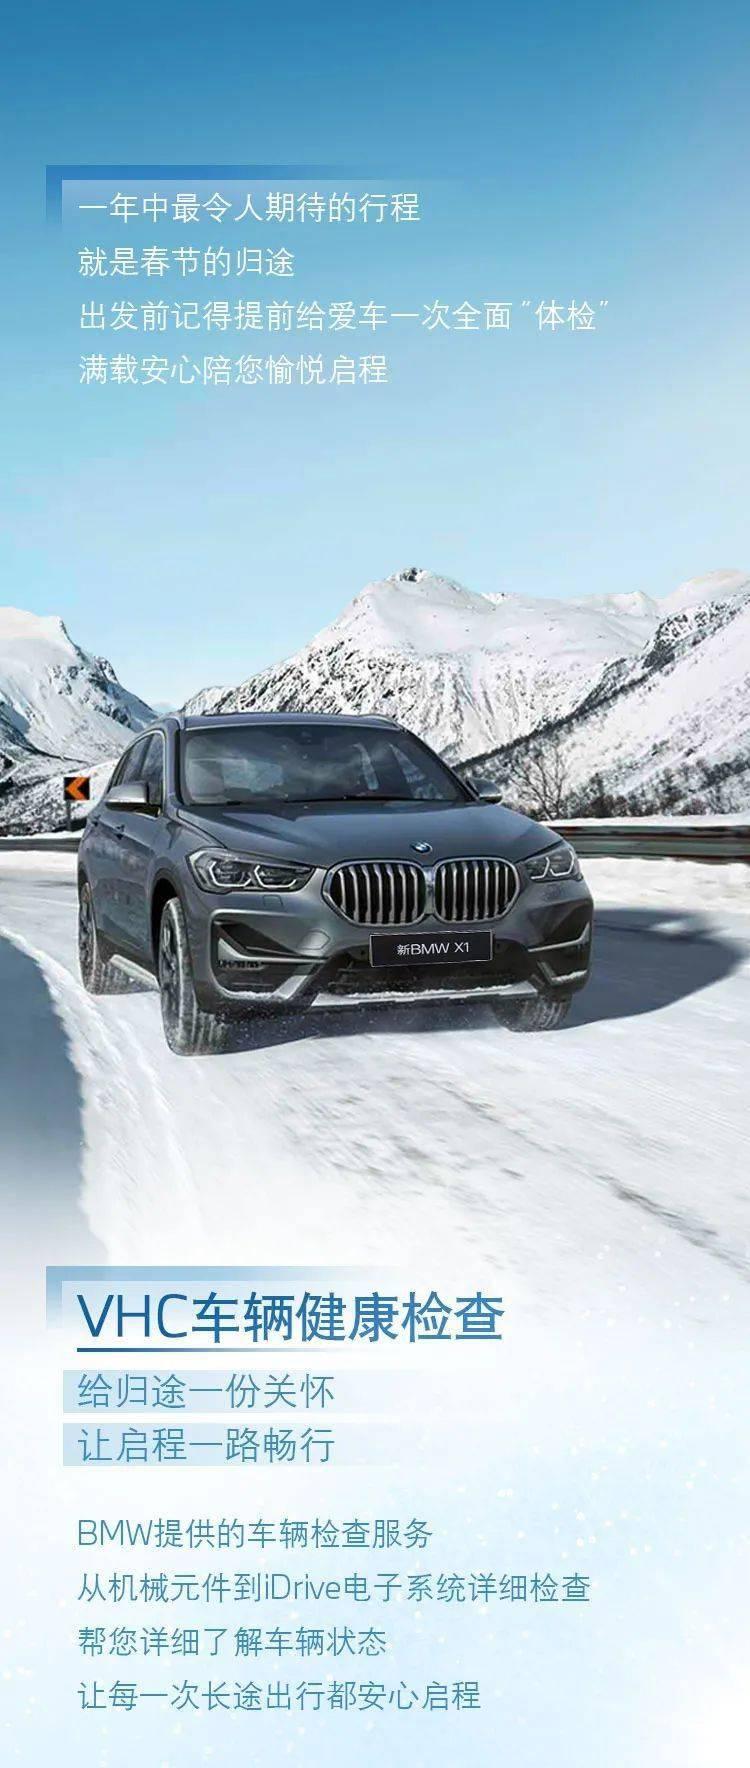 BMW车辆健康检查陪您驶向新一年